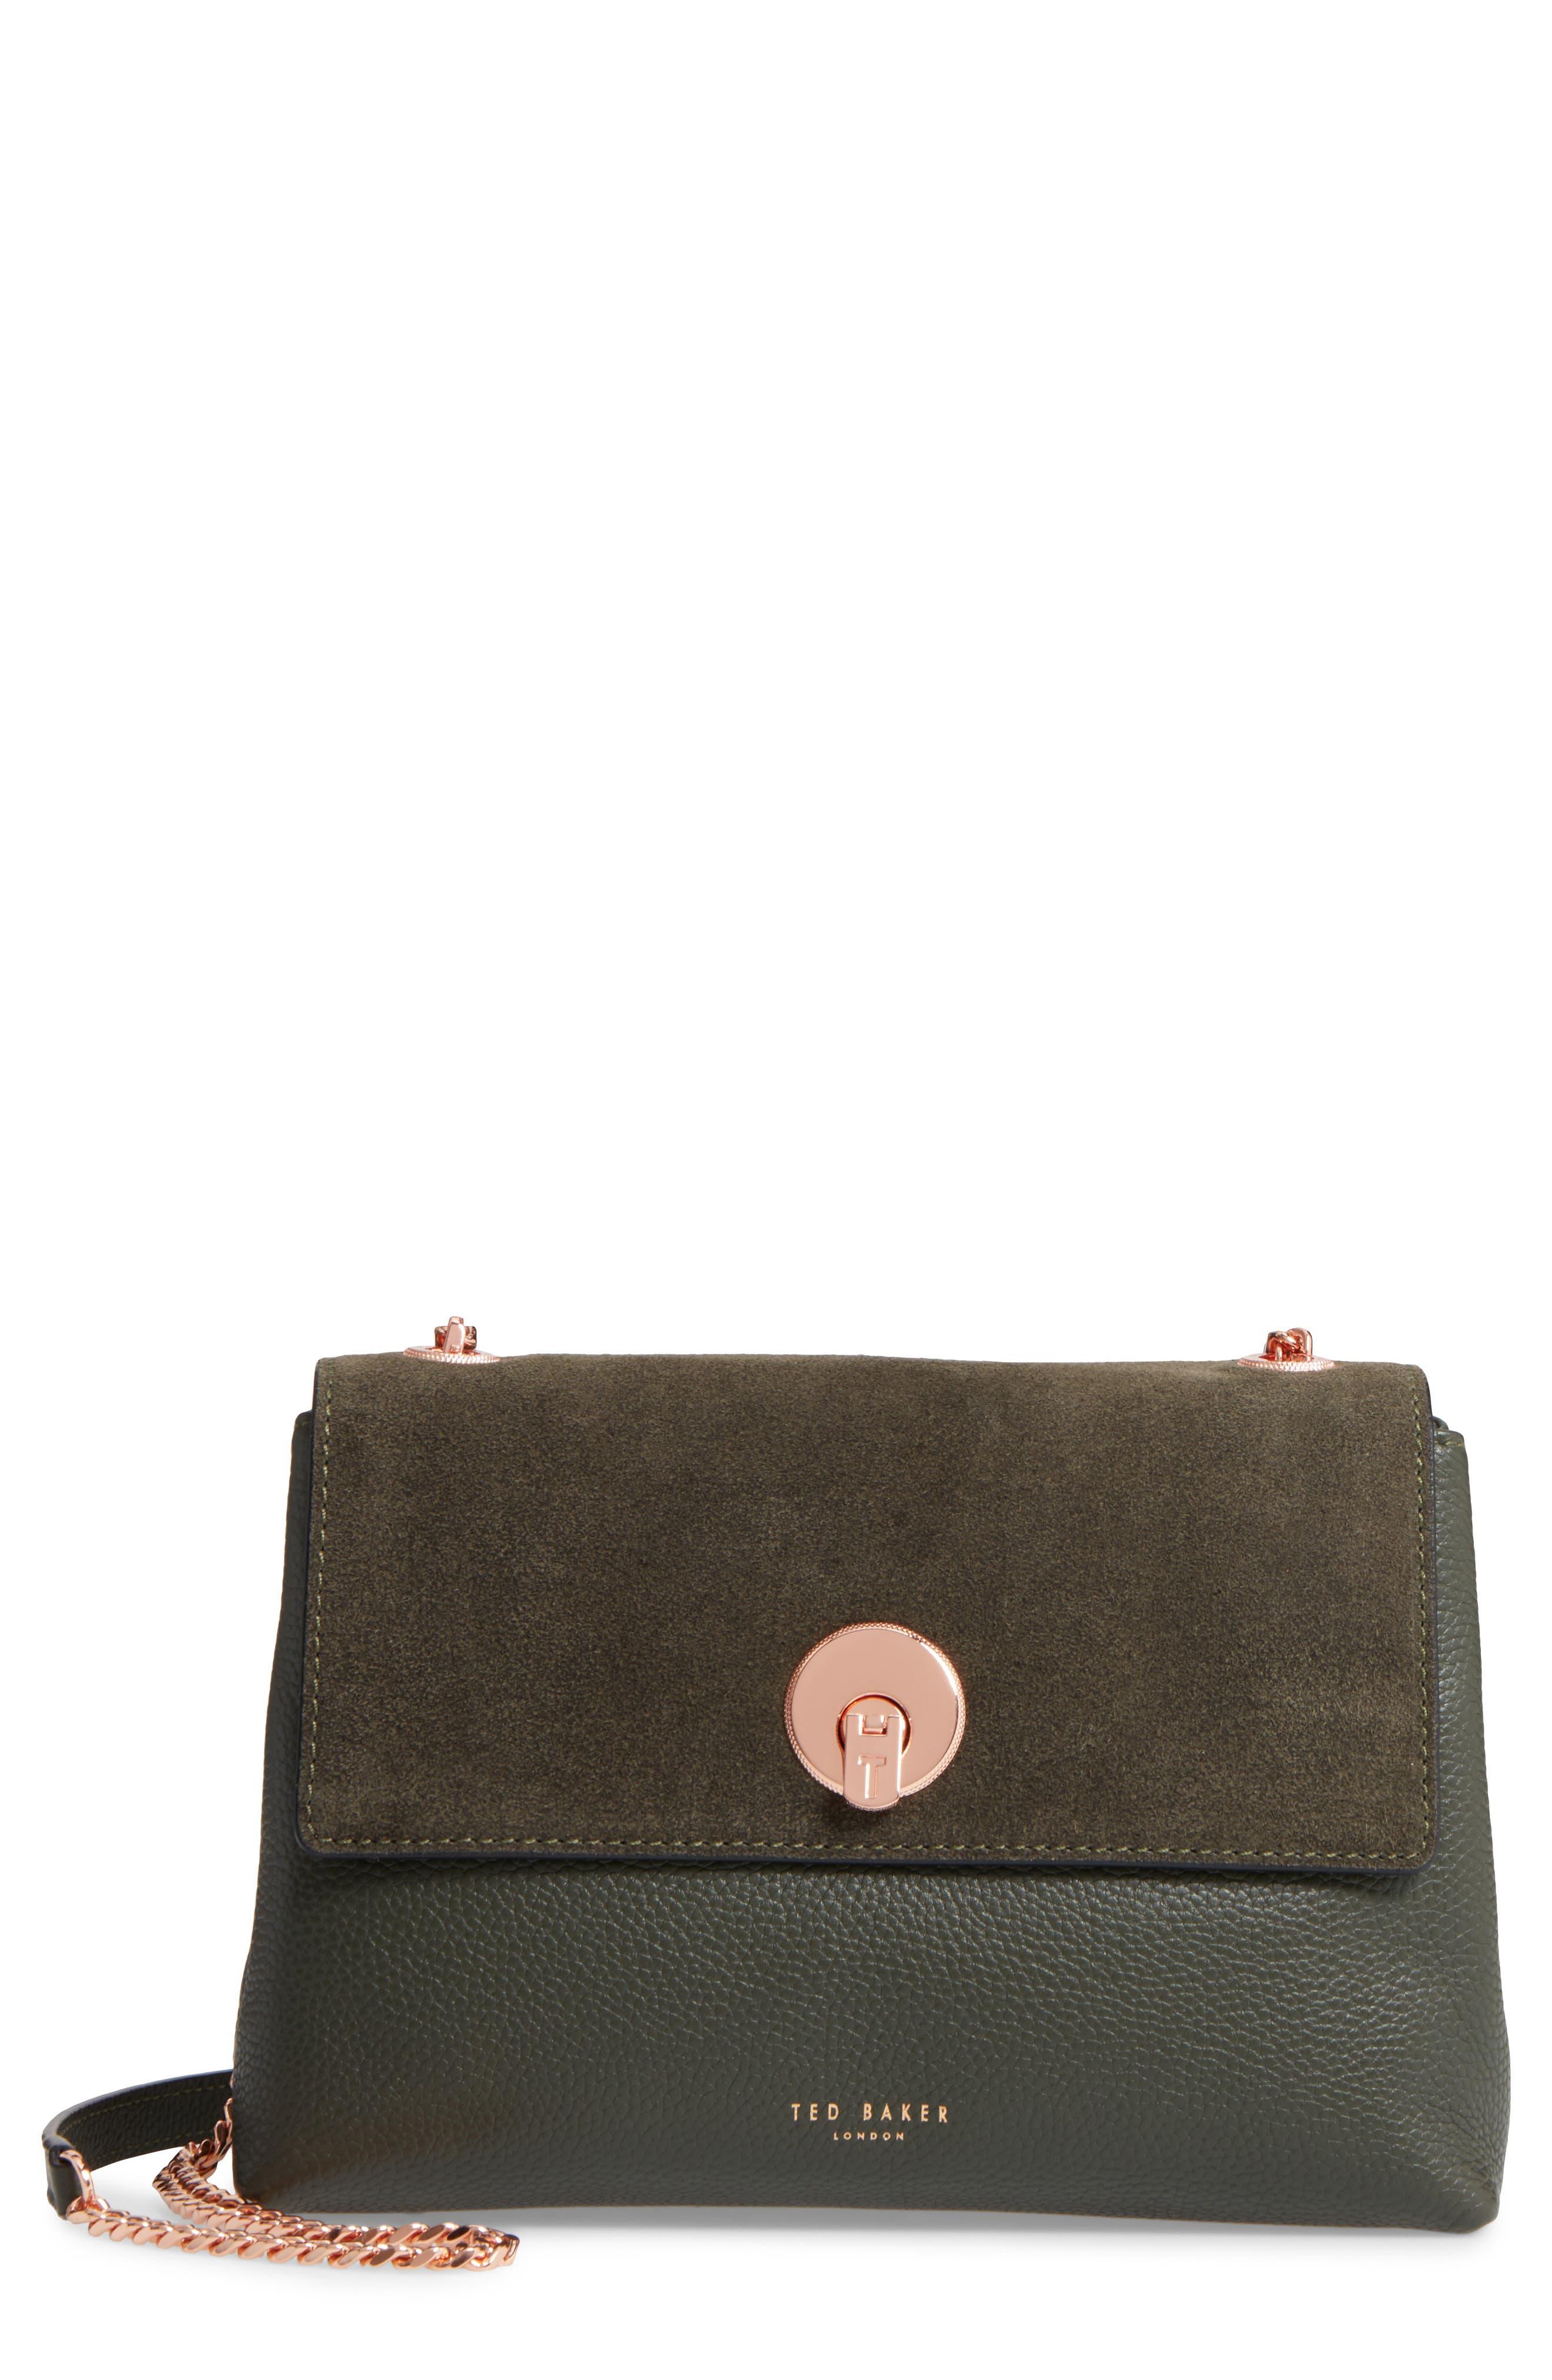 Sorikai Leather & Suede Crossbody Bag,                             Main thumbnail 1, color,                             Khaki